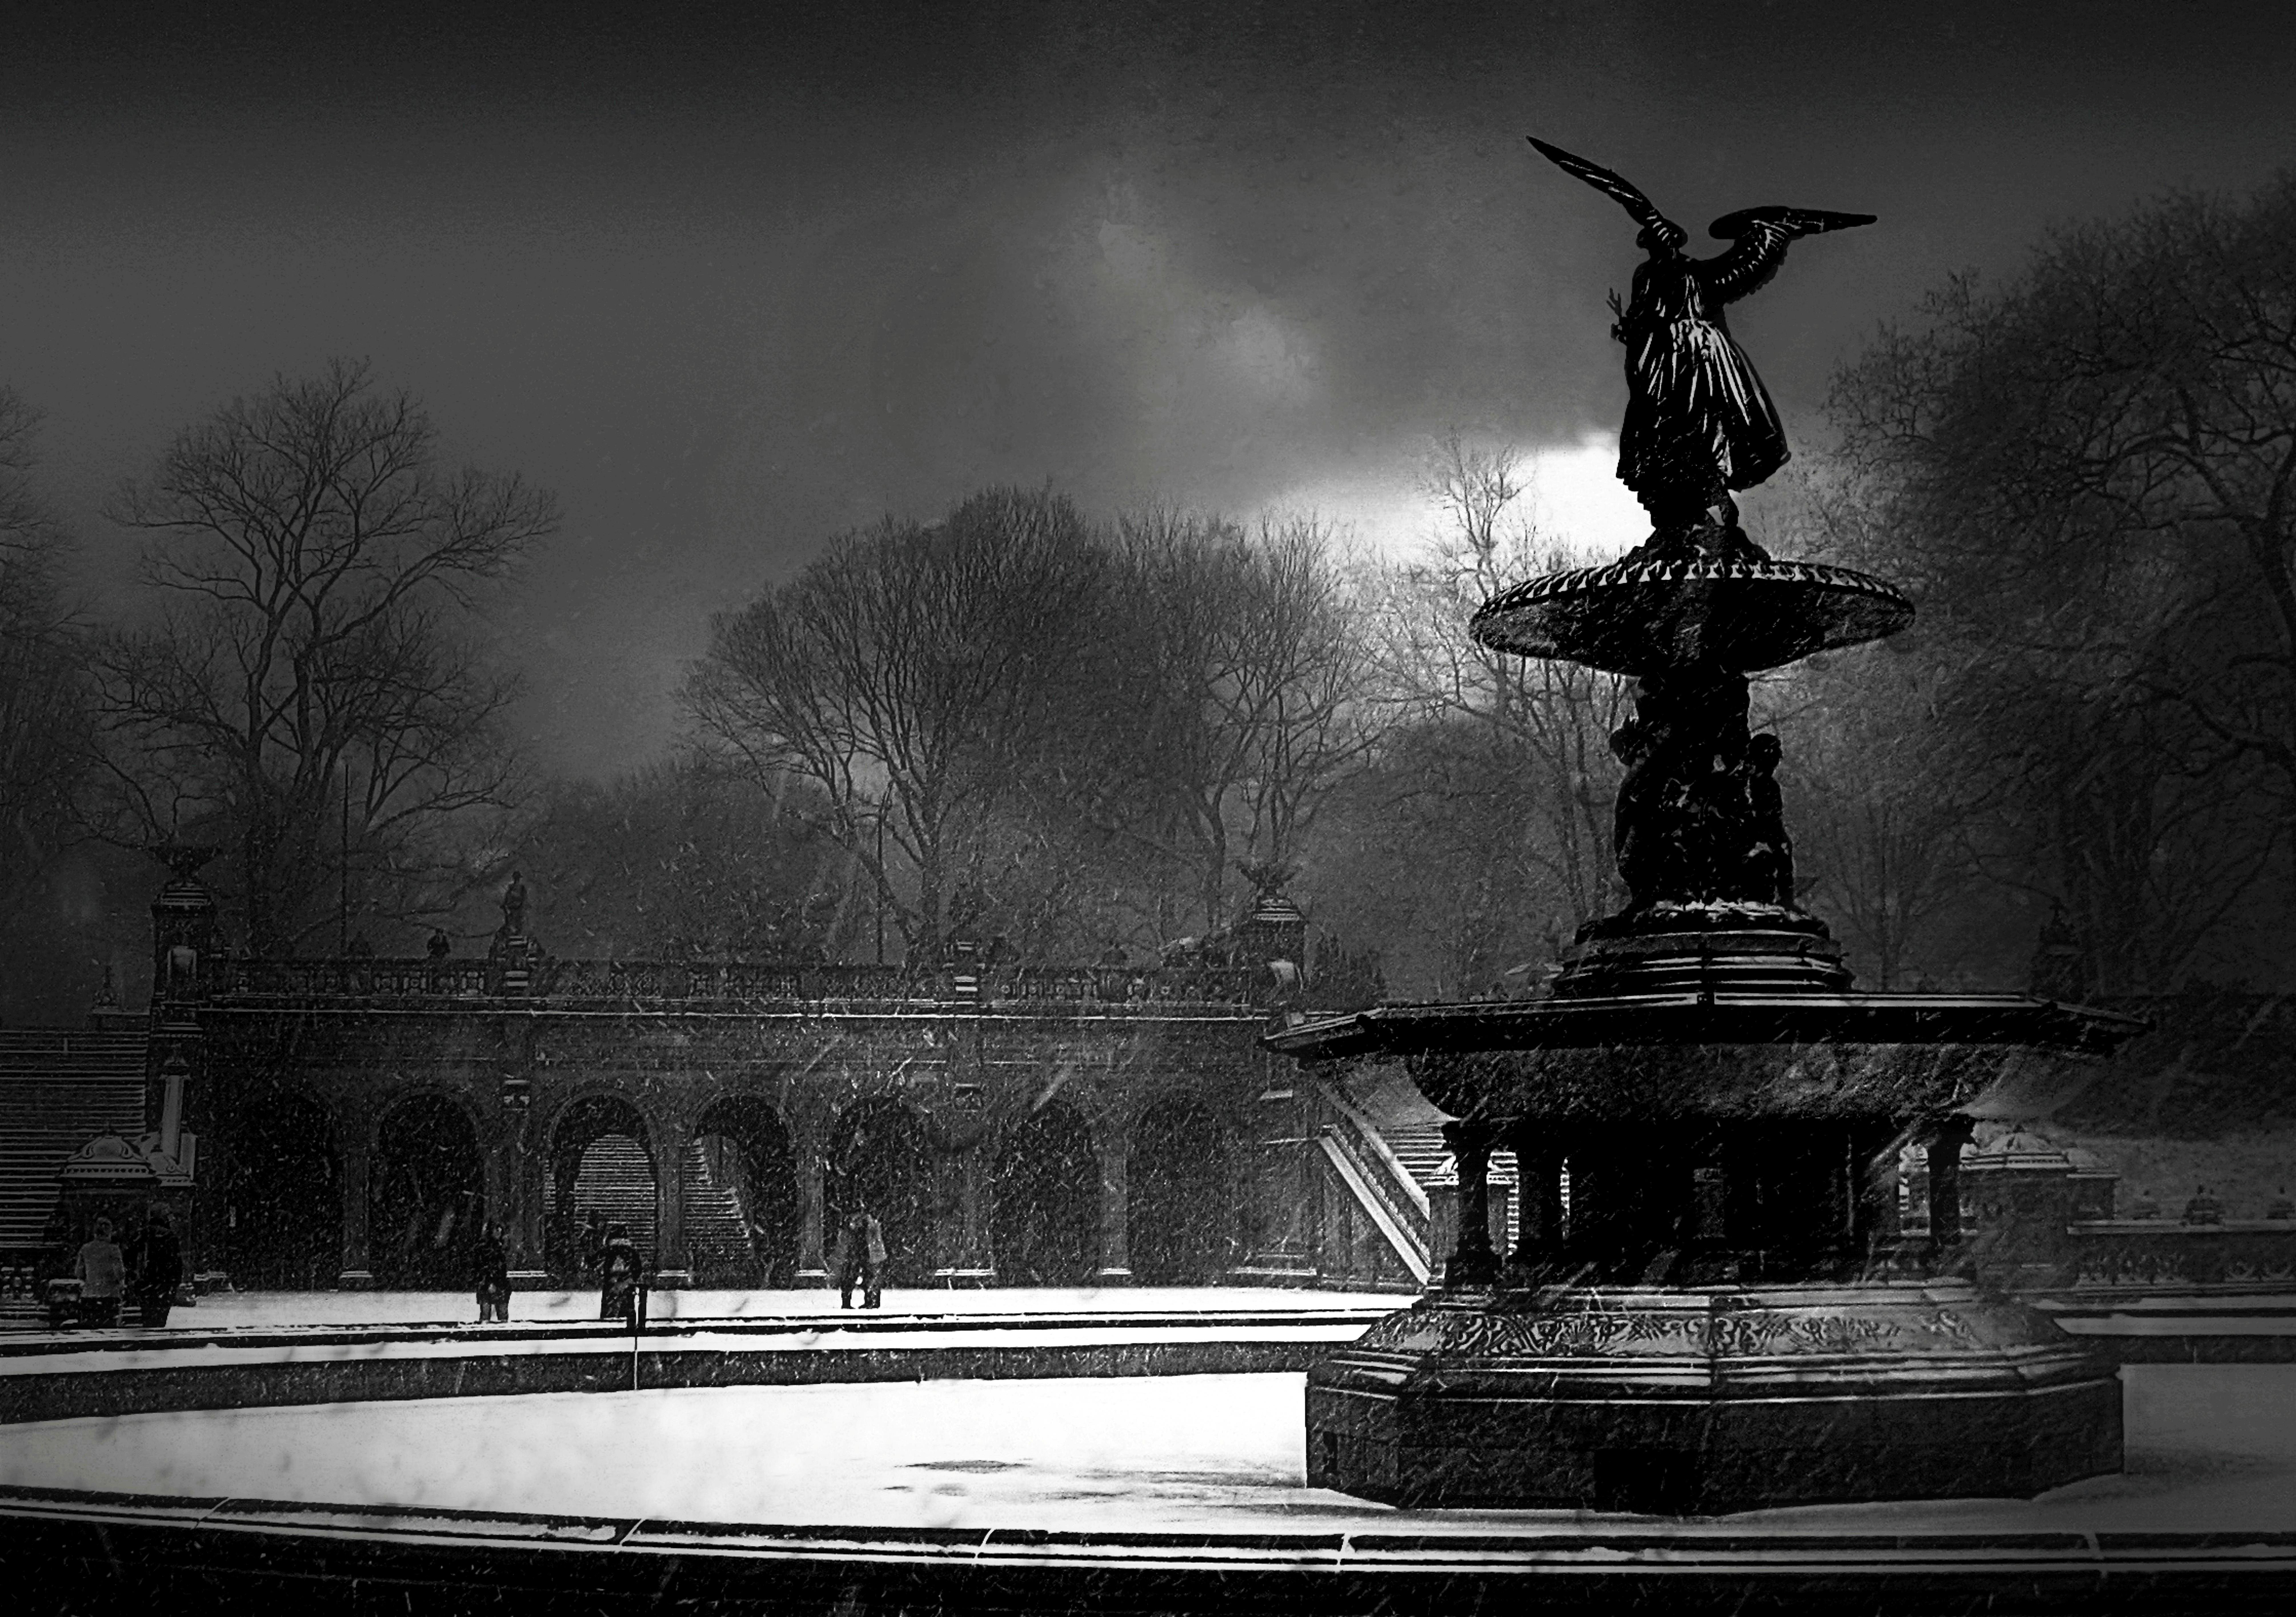 Jeff-Watts-Bethesda-Storm-Photography